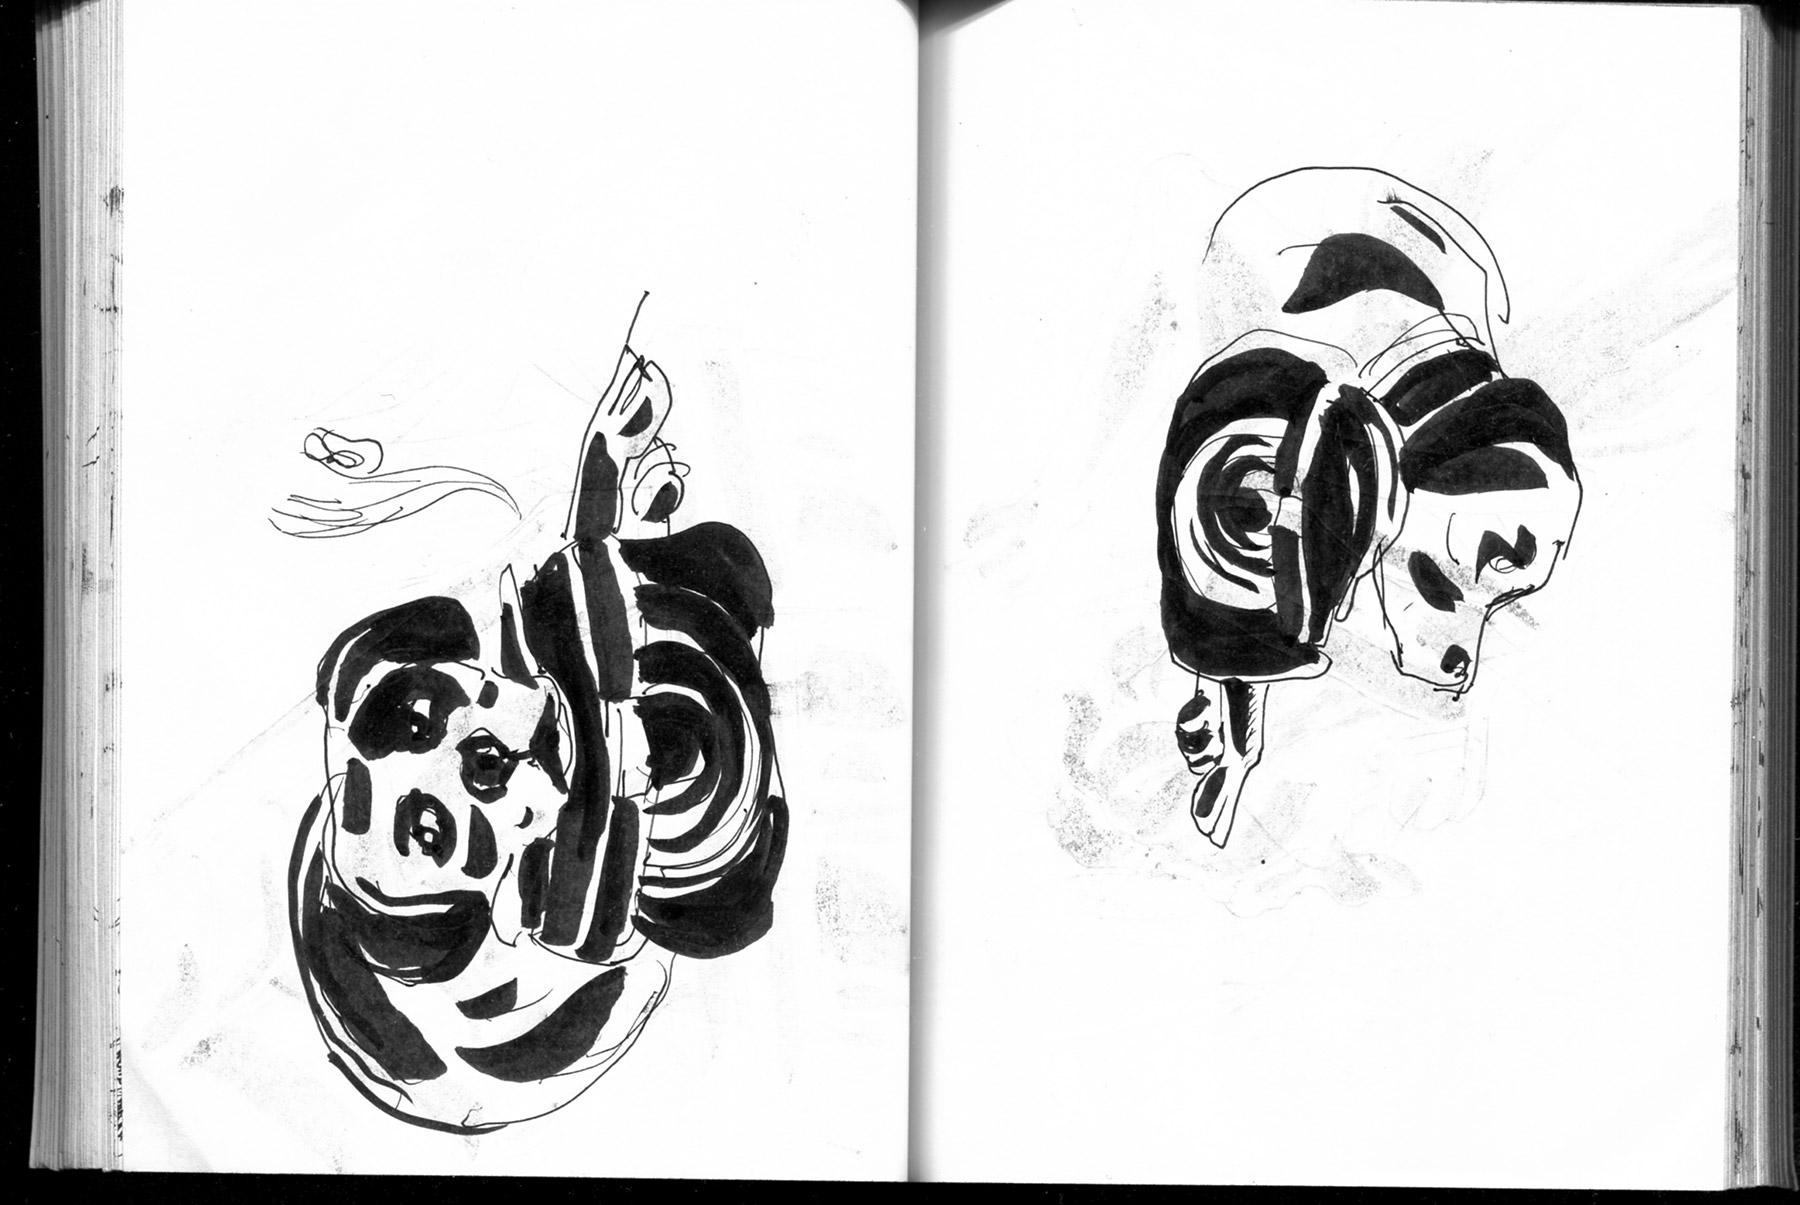 davidm_sketches_2014_08-207.jpg